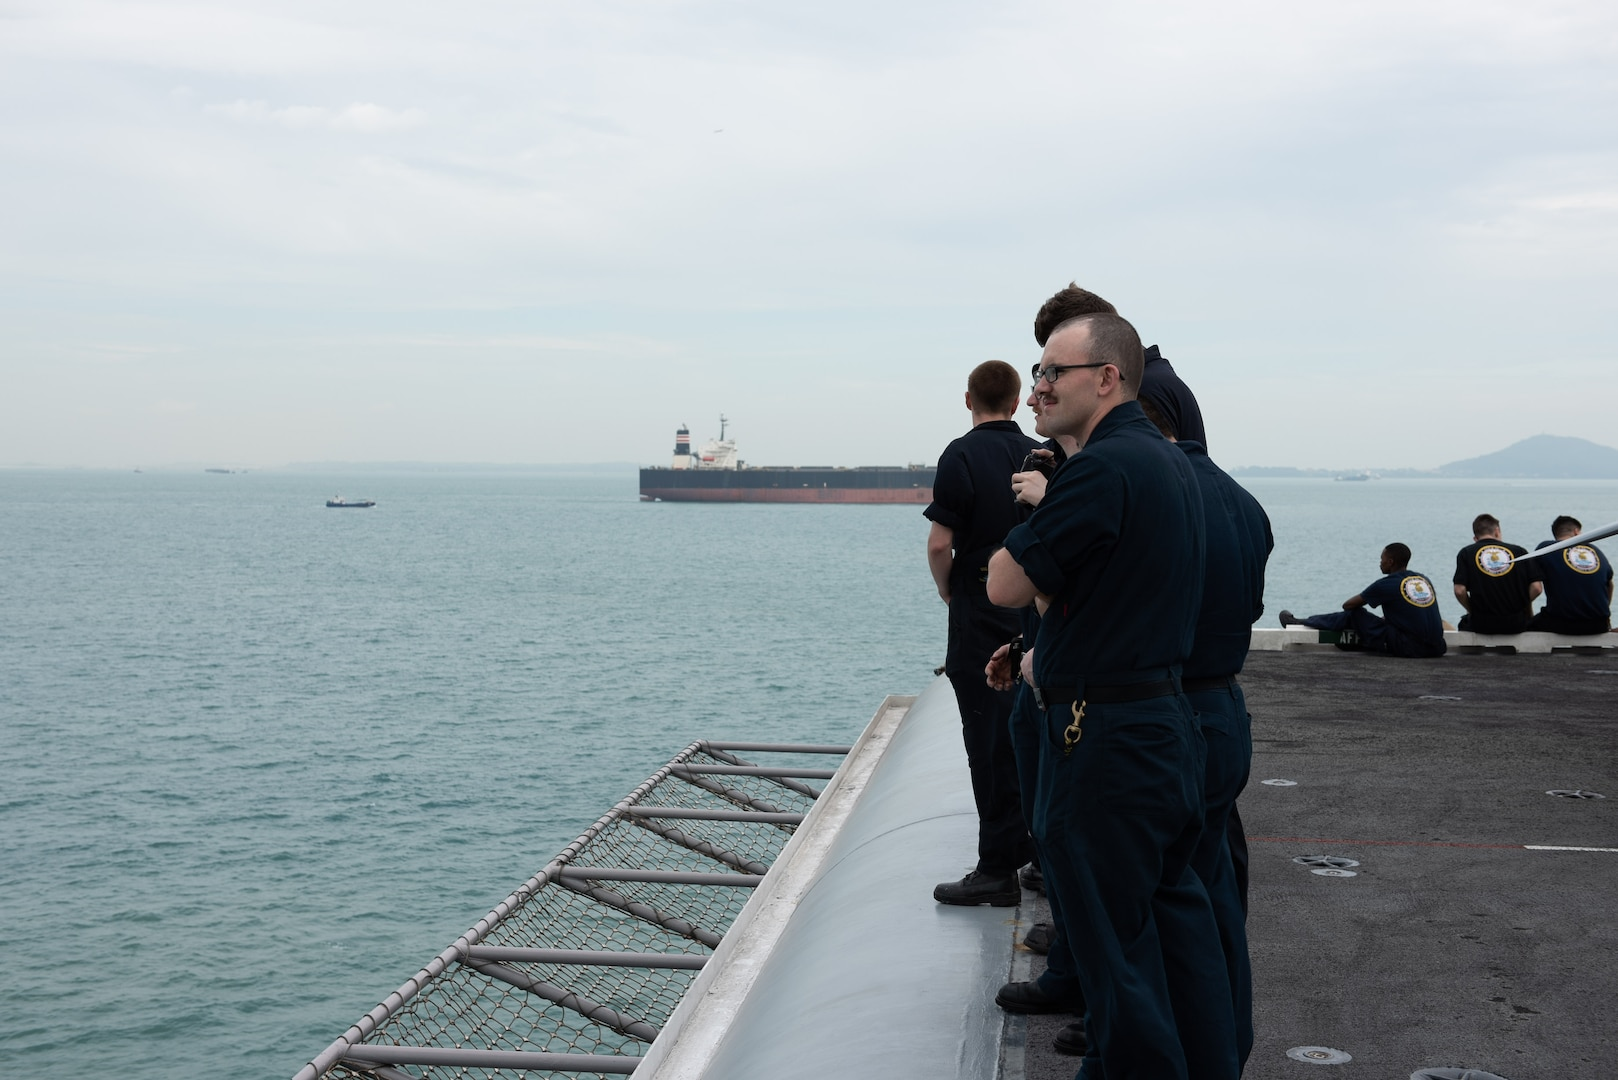 John C. Stennis Carrier Strike Group Ships Visit Singapore